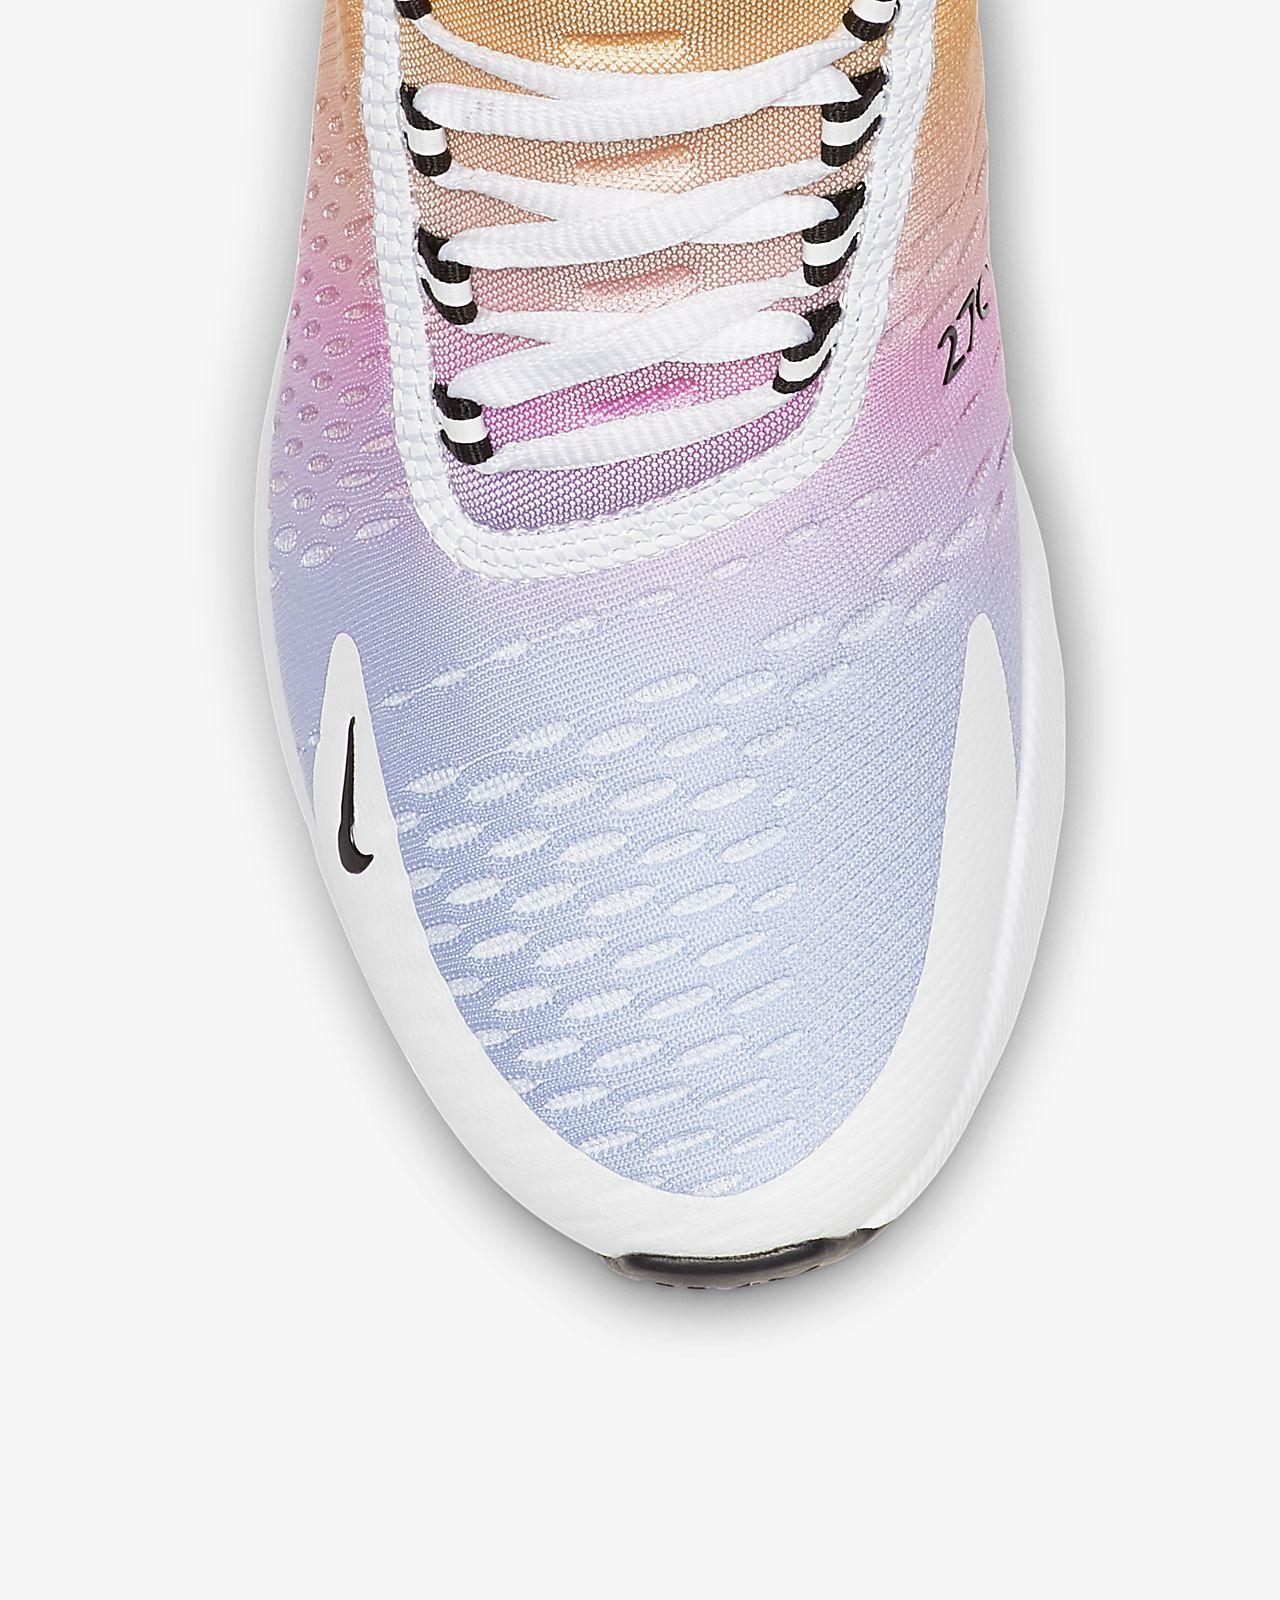 Fuxia B19019 Femme Px027 Sneakers Liu Jo k0XnwO8P